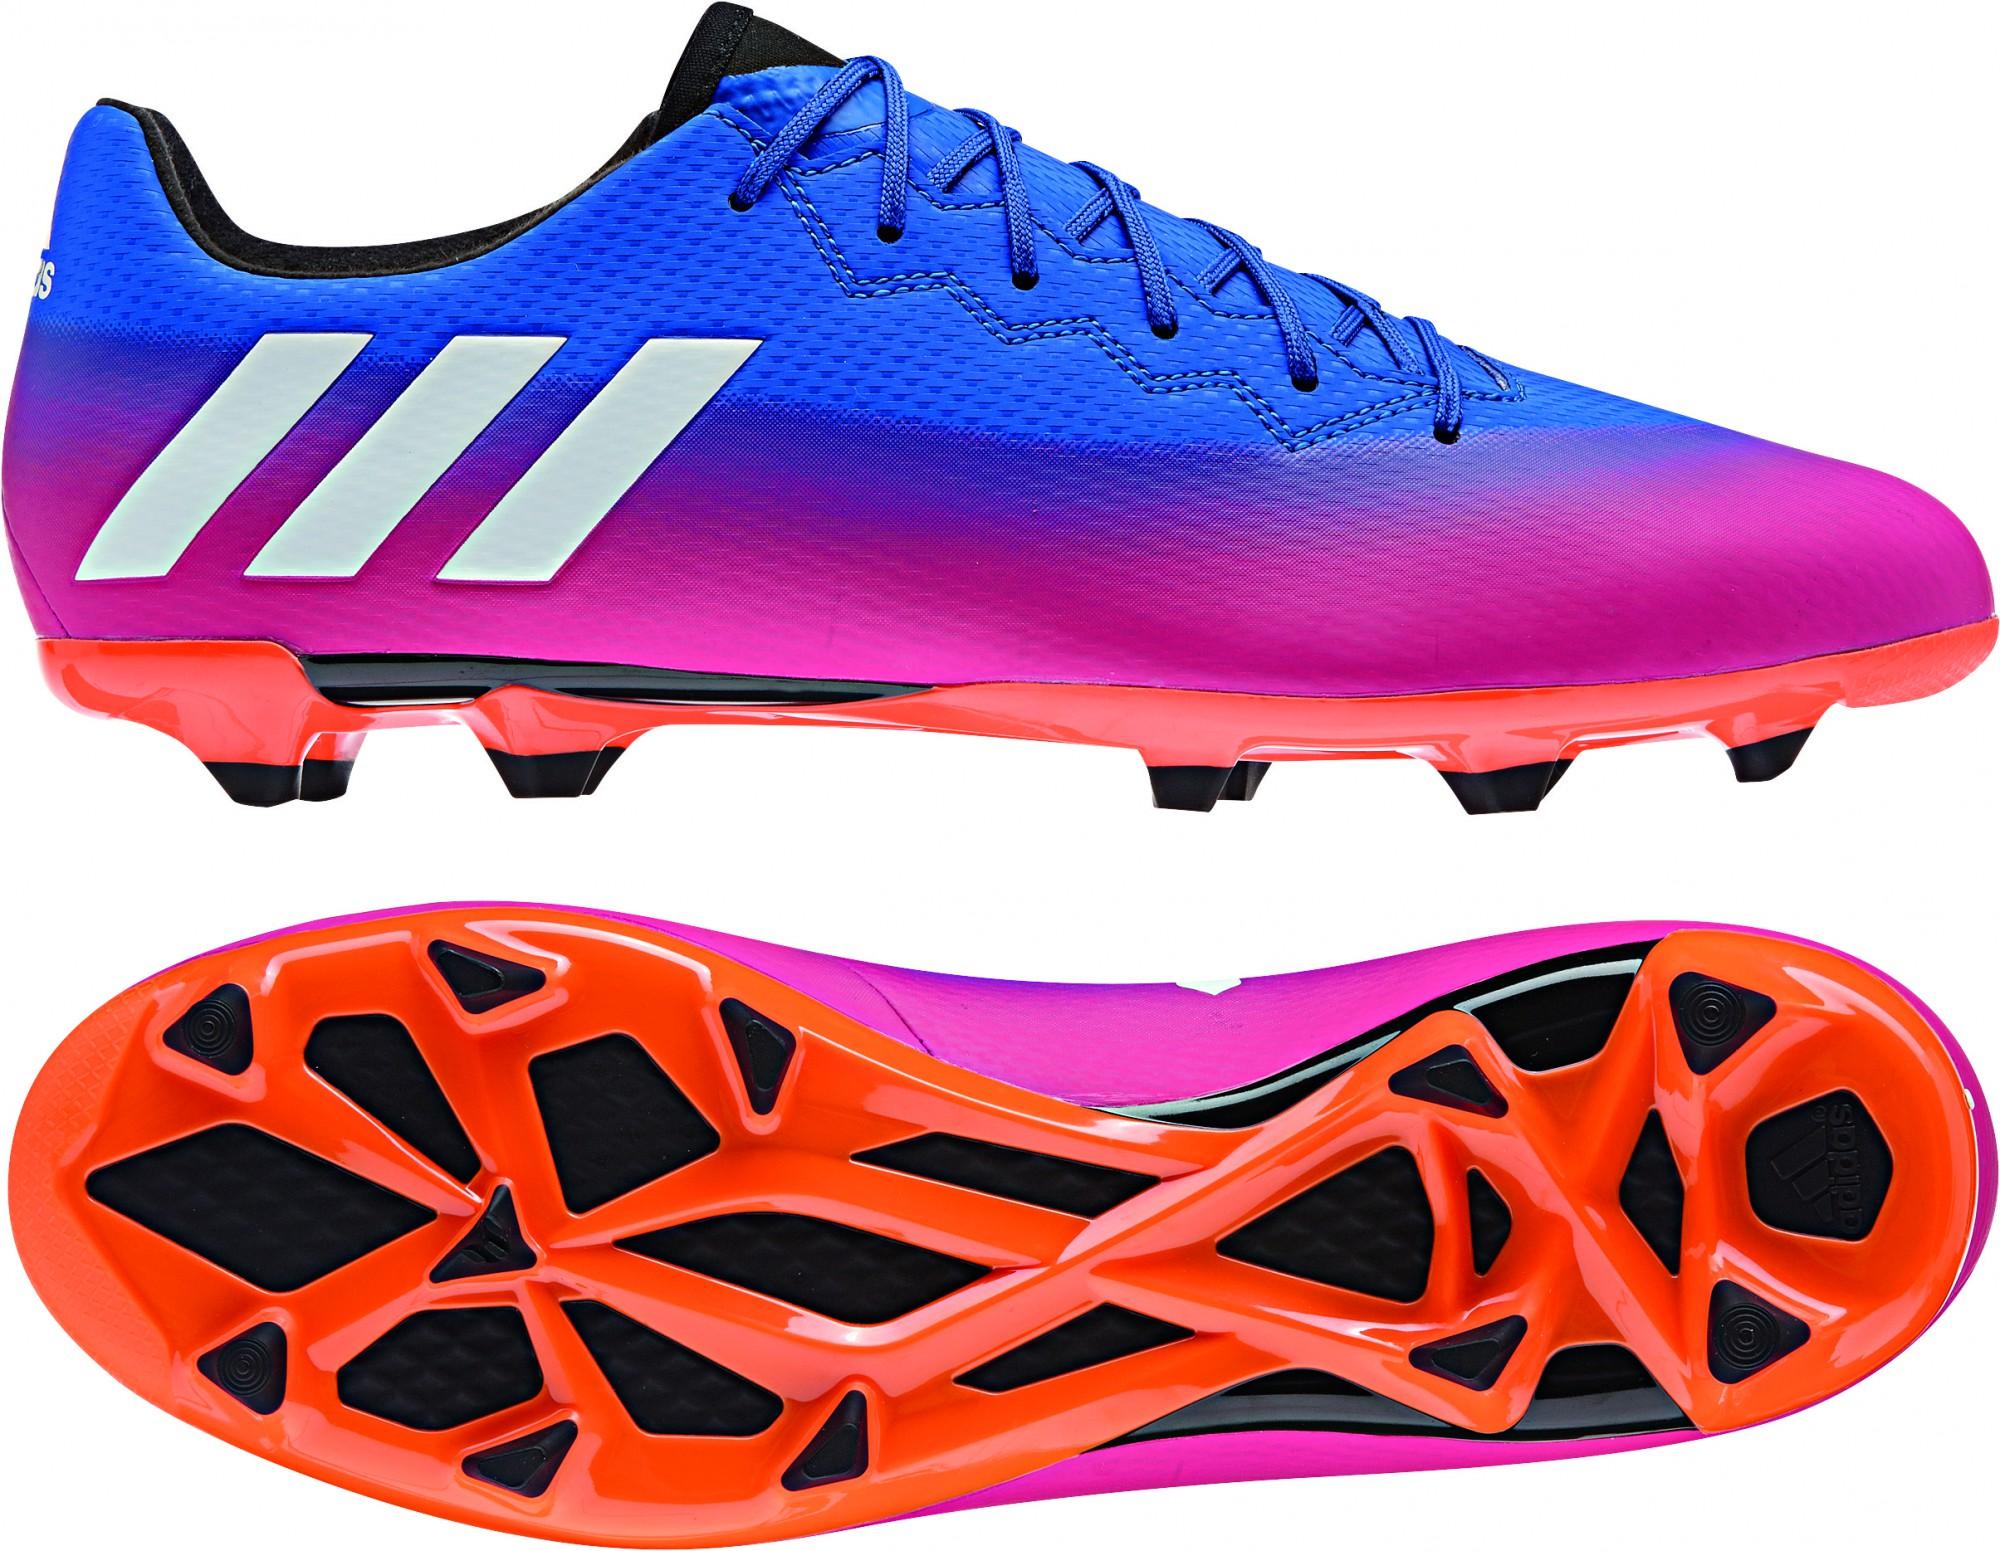 Pink 3 Blau Schuhe Adidas Messi Fussballschuhe Fg 16 If76myvgyb